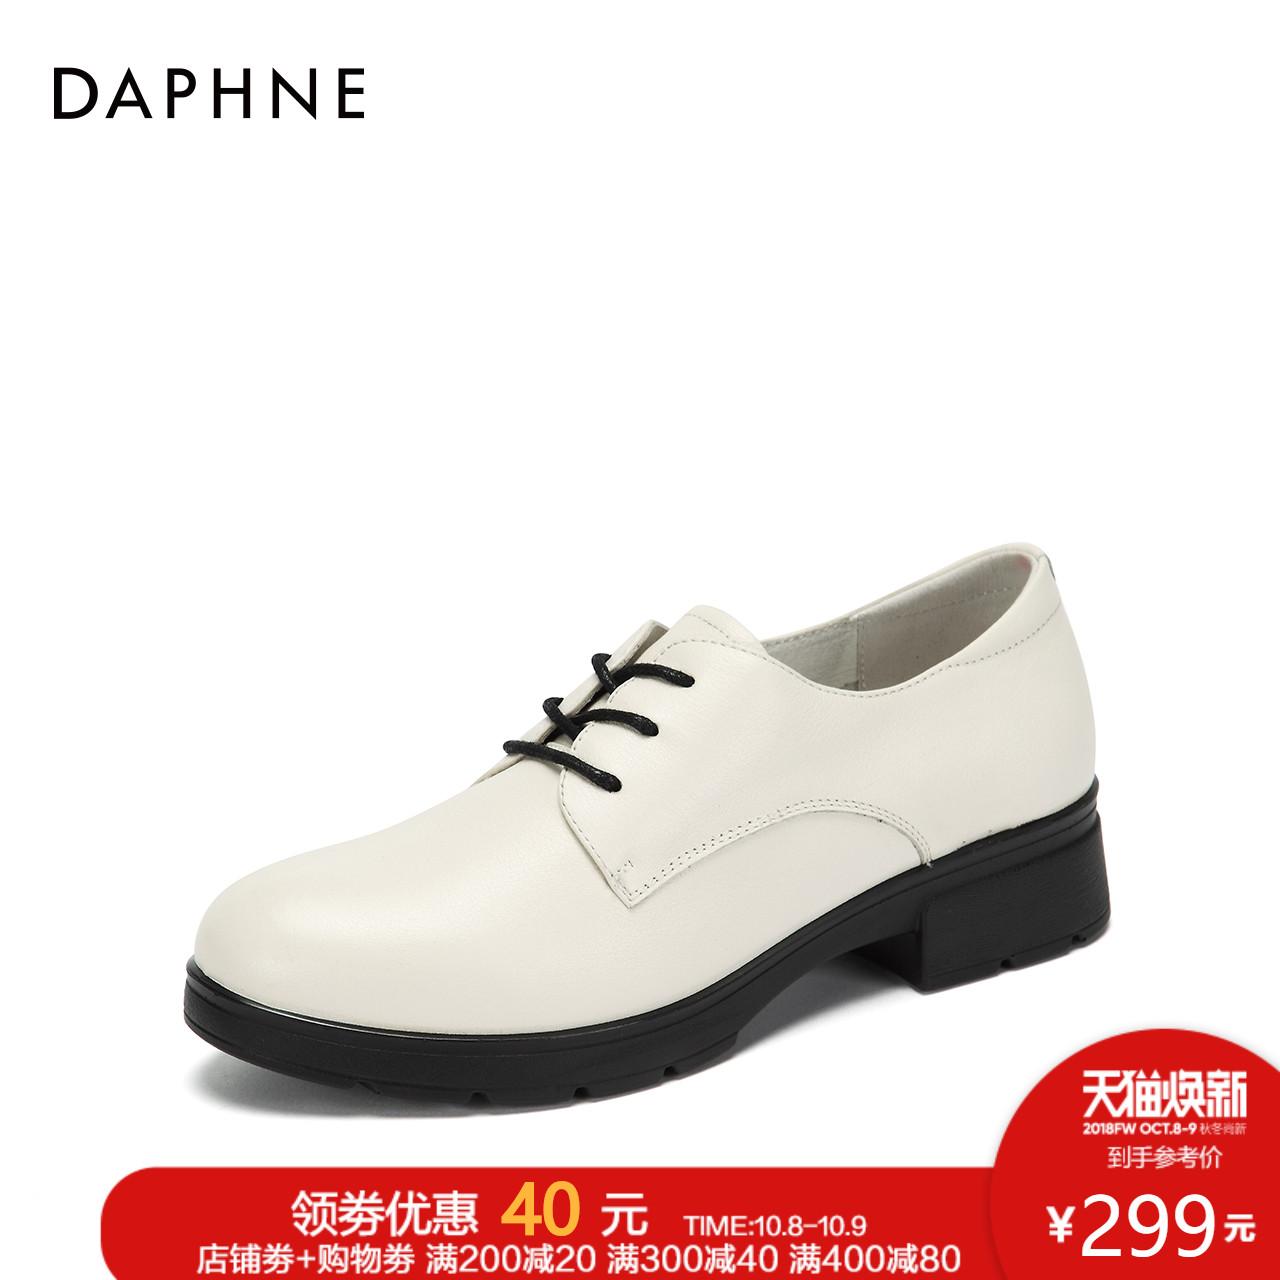 Daphne-达芙妮2018秋新款简约牛皮圆头牛津鞋休闲纯色系带单鞋女